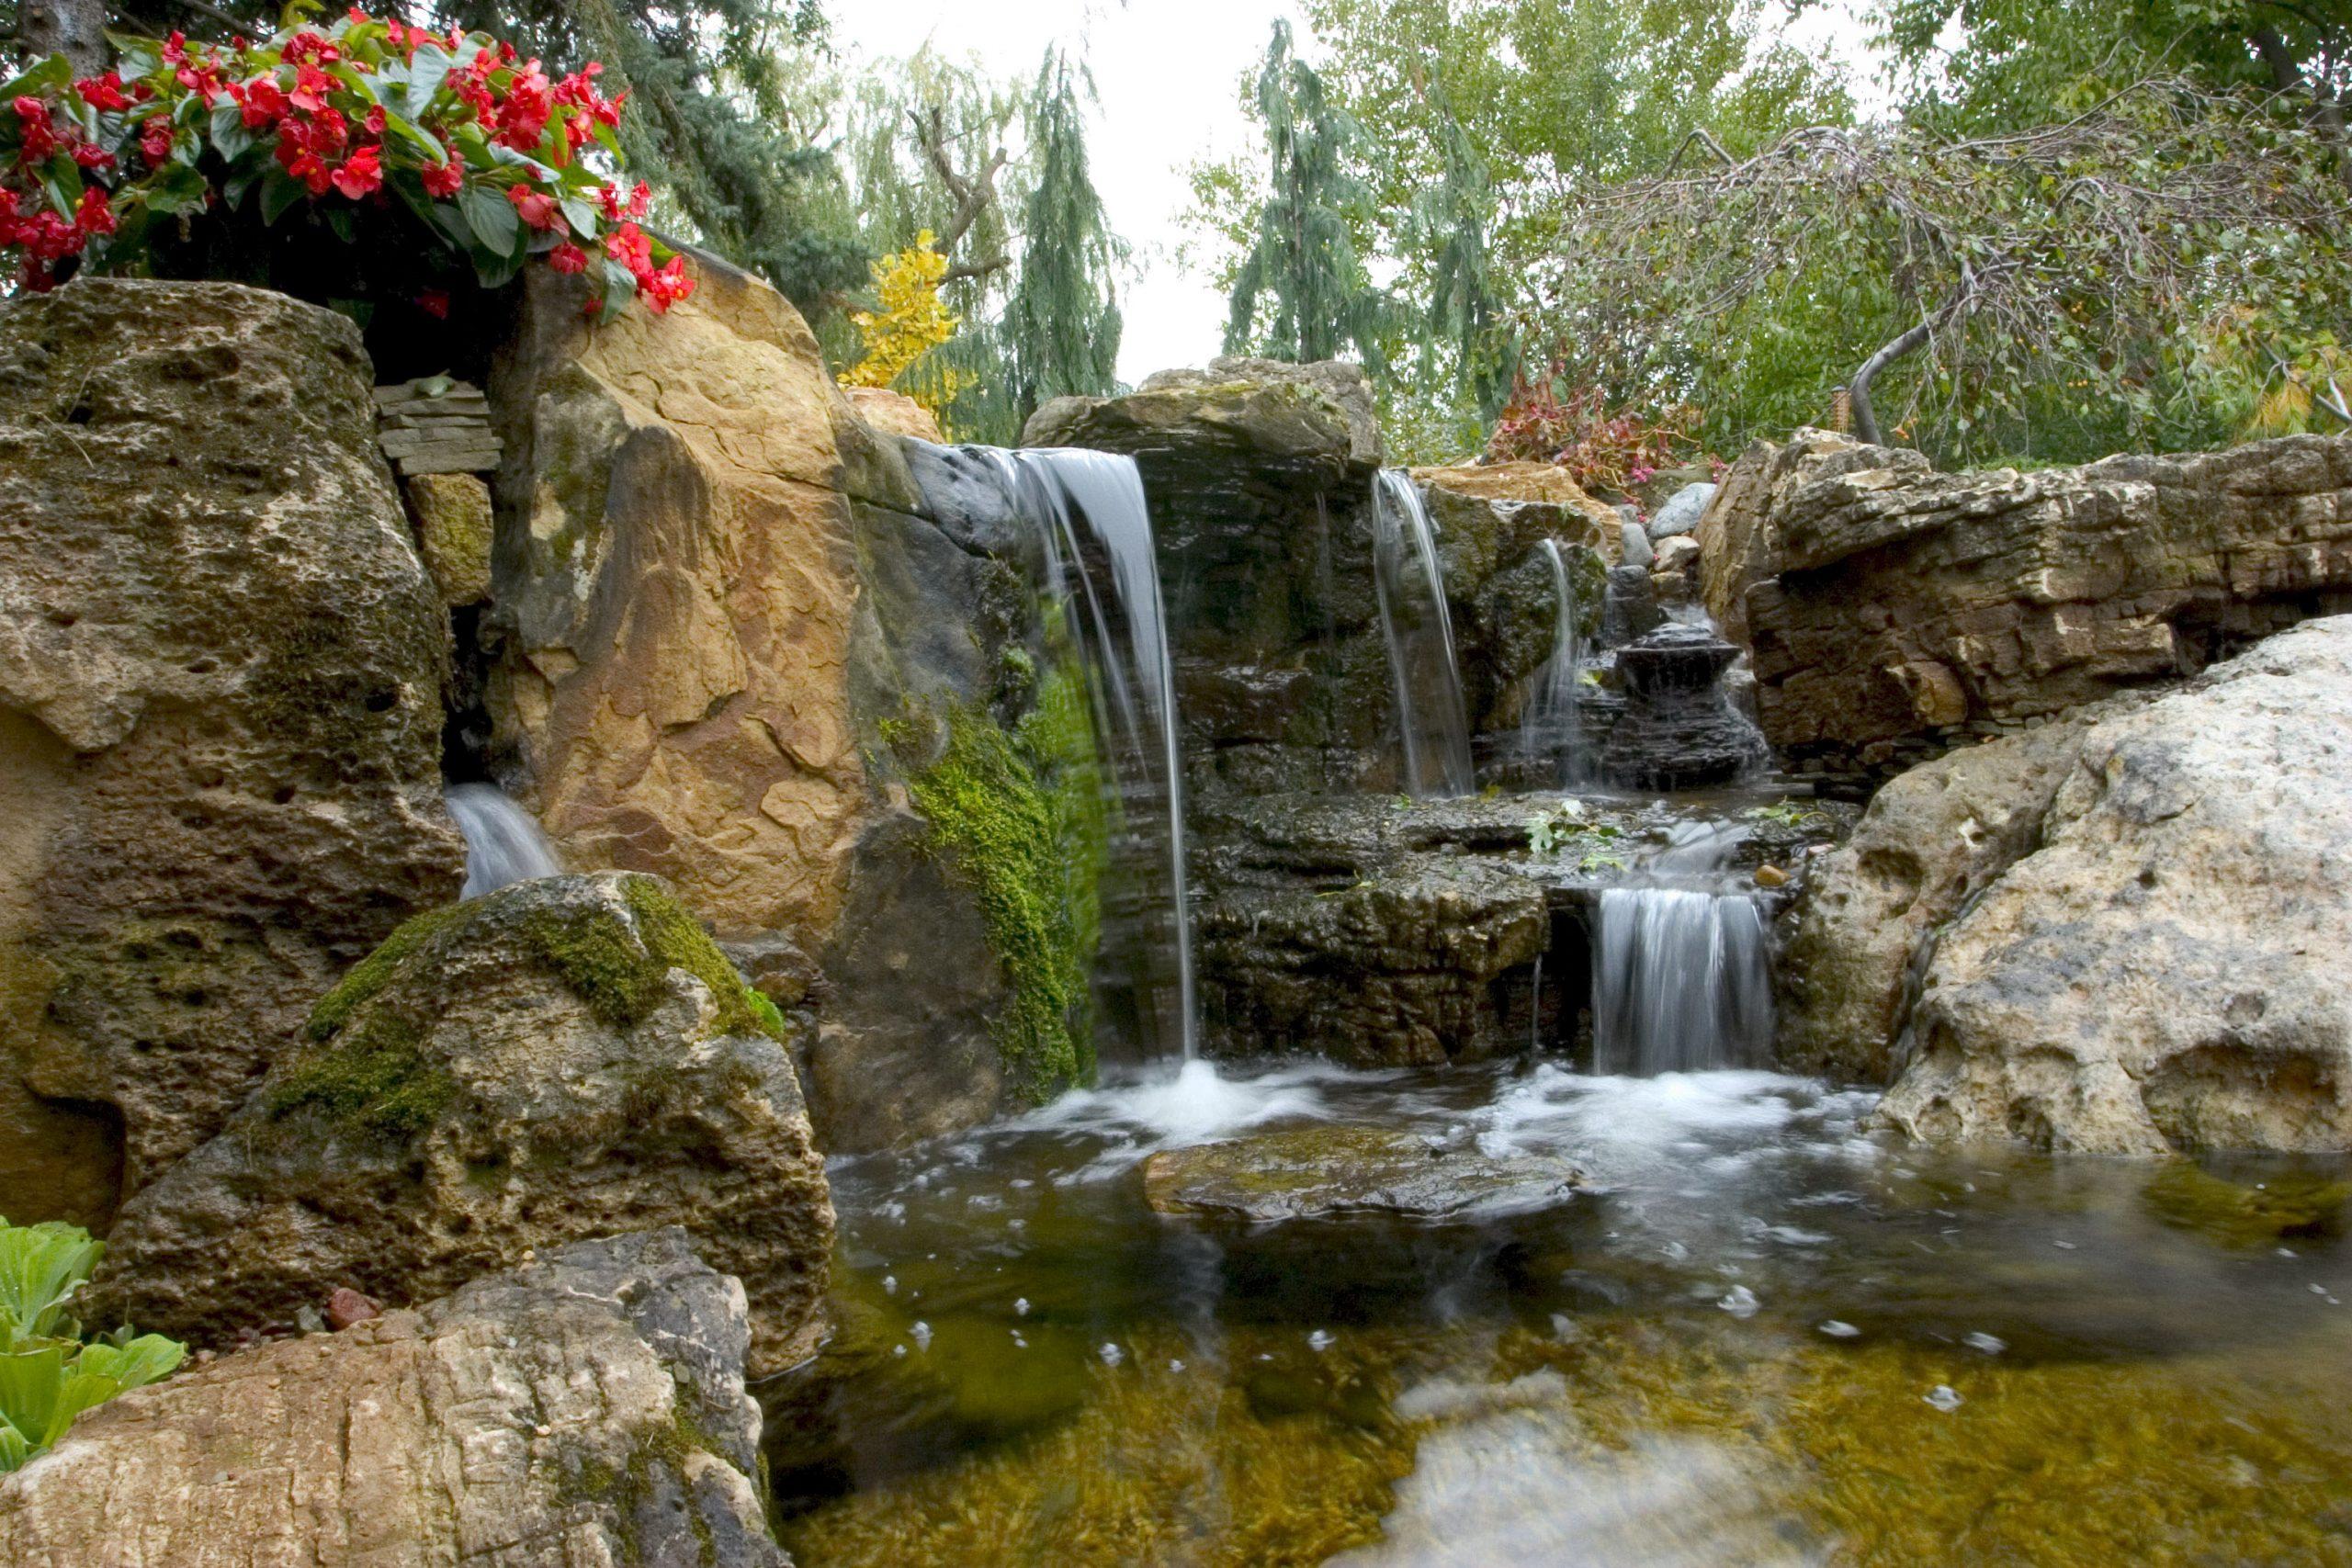 Waterfall in Brian Helfrich Backyard